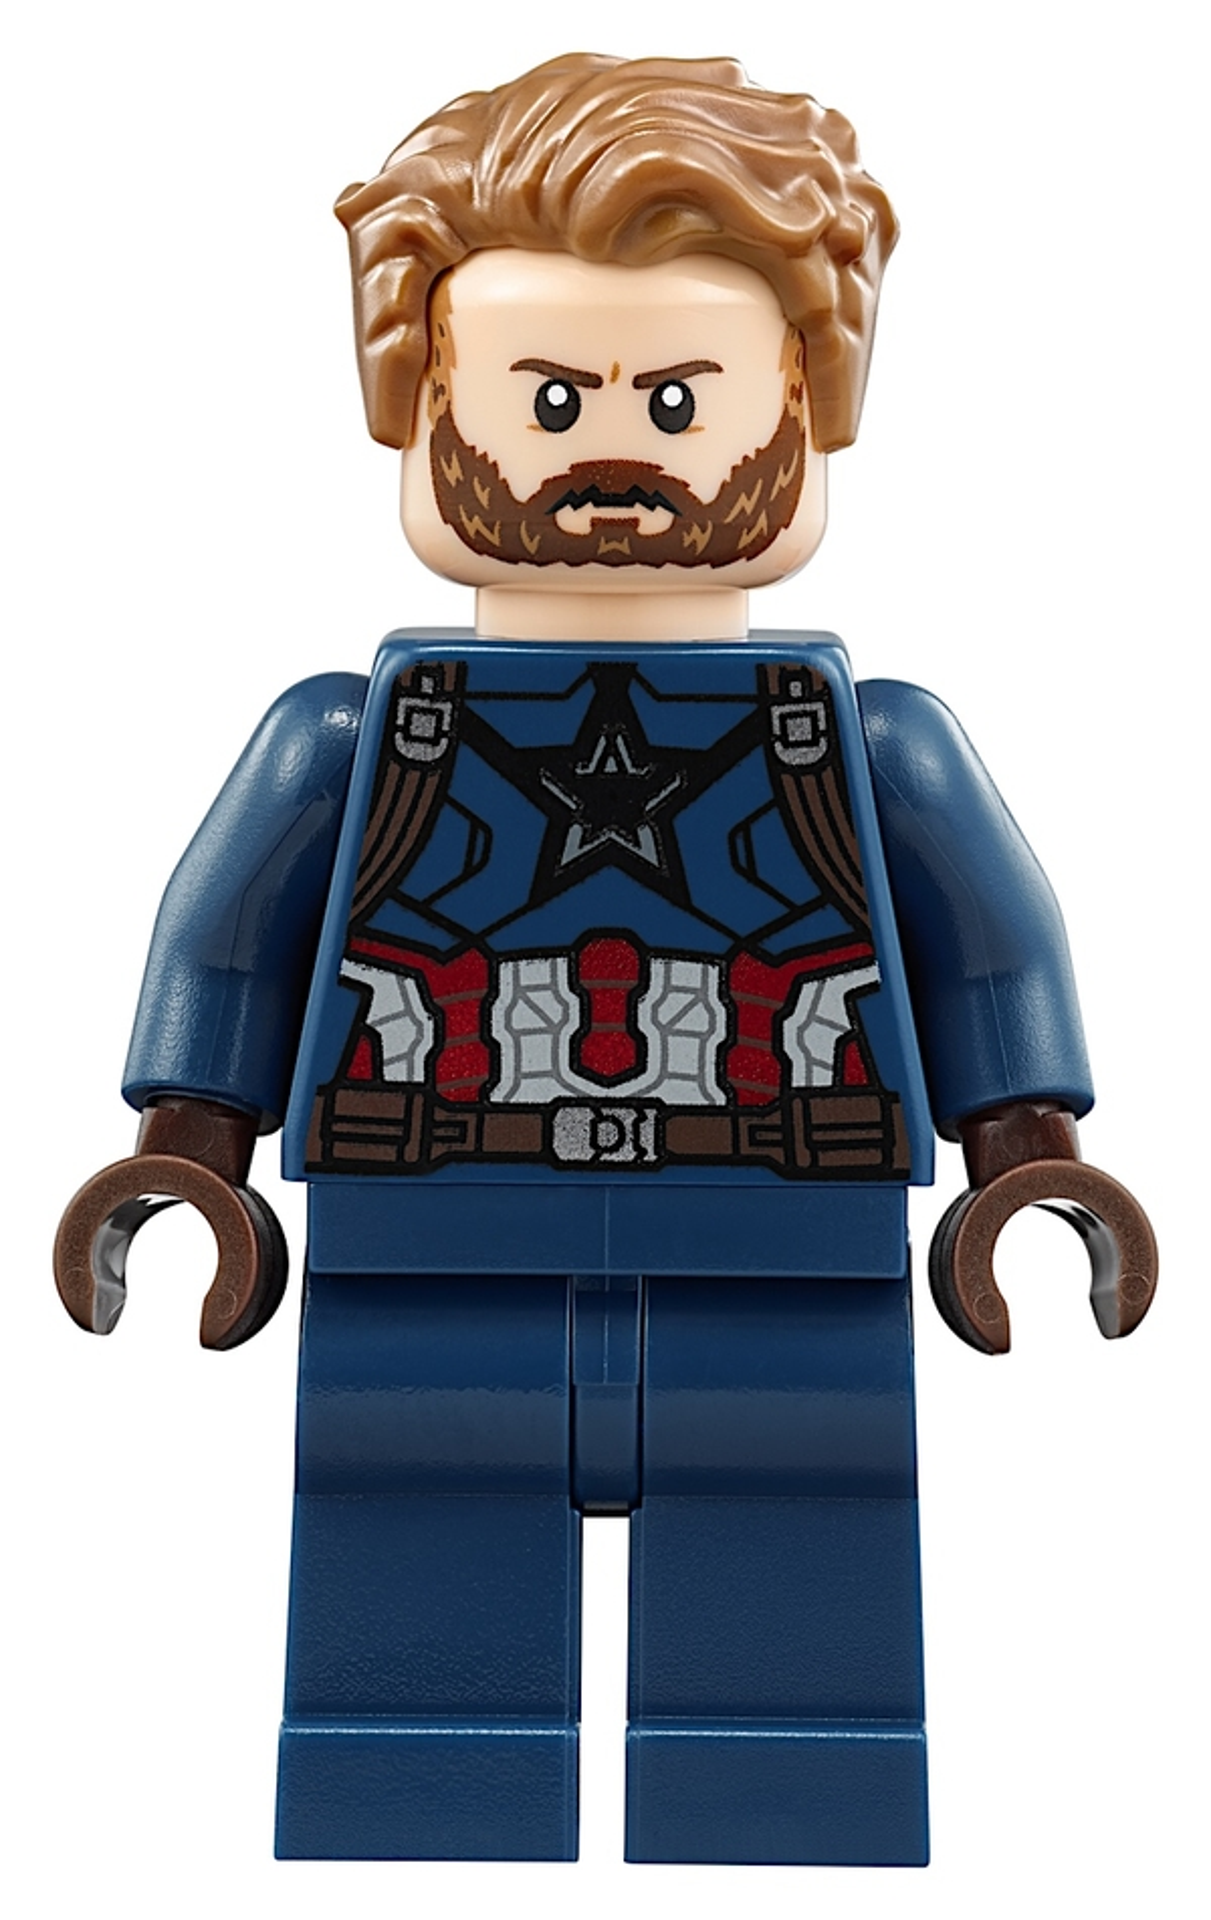 Lego marvel avengers release date in Brisbane